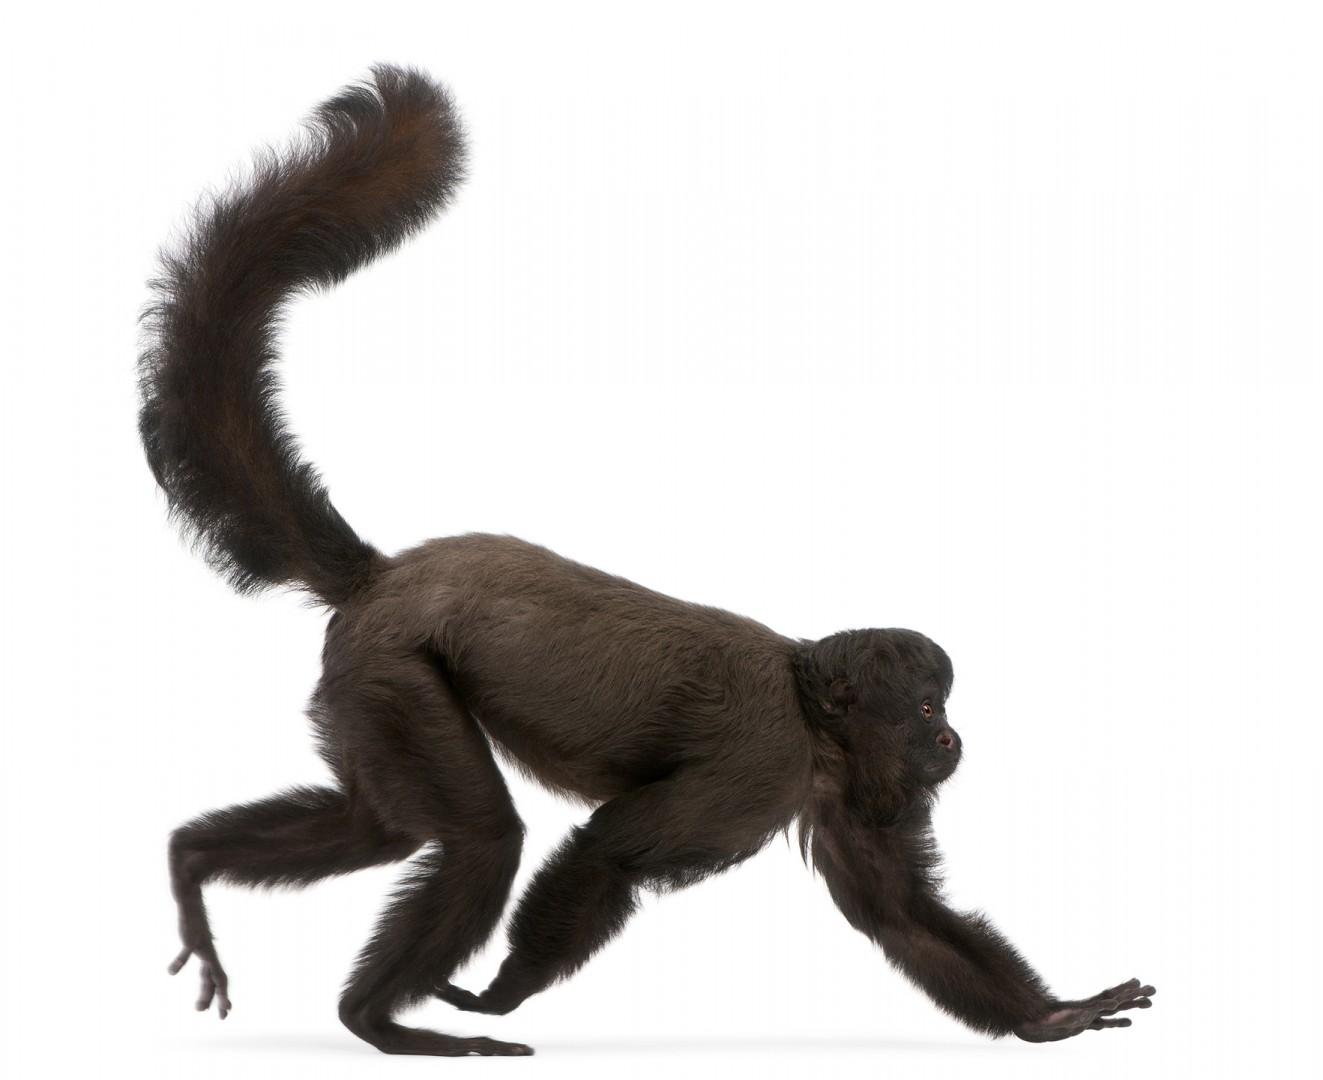 Black Bearded Saki - Part of the book Zoo'M : http://goo.gl/g7j31Q